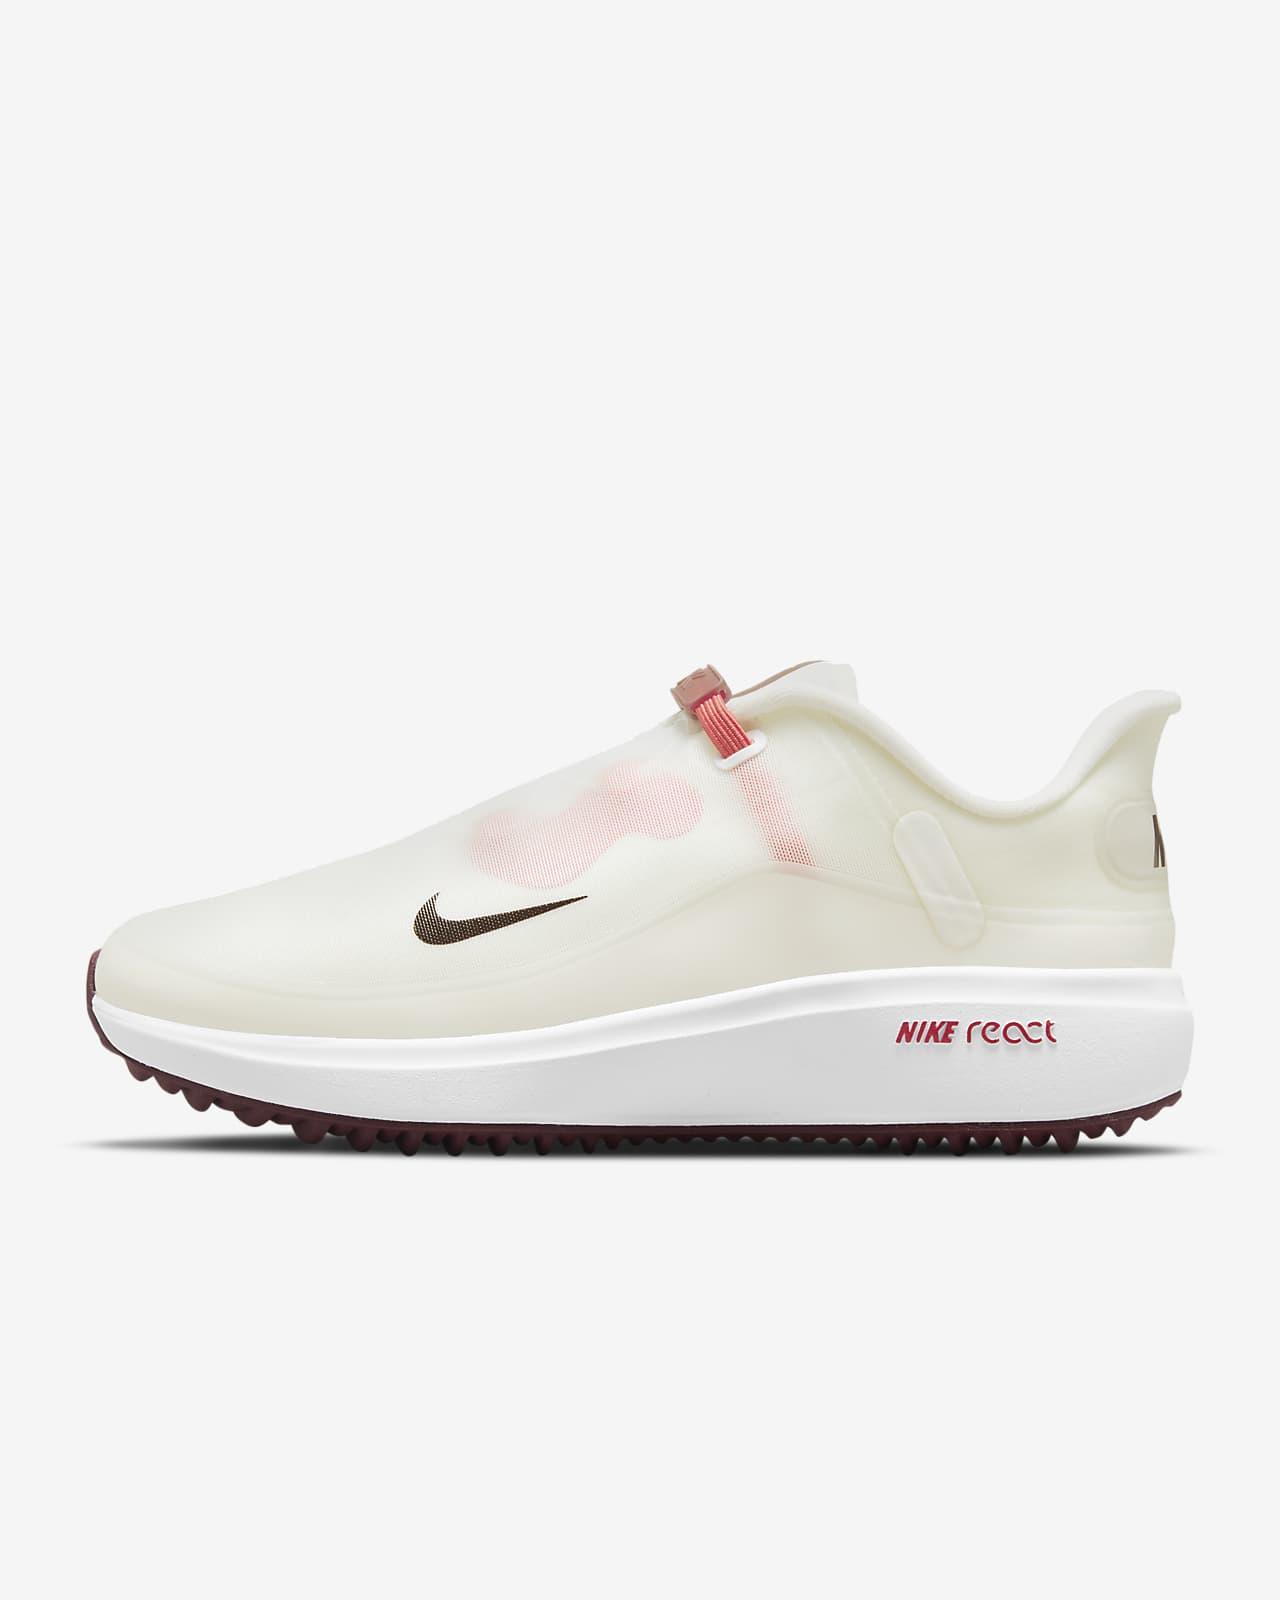 Nike React Ace Tour Damen-Golfschuh